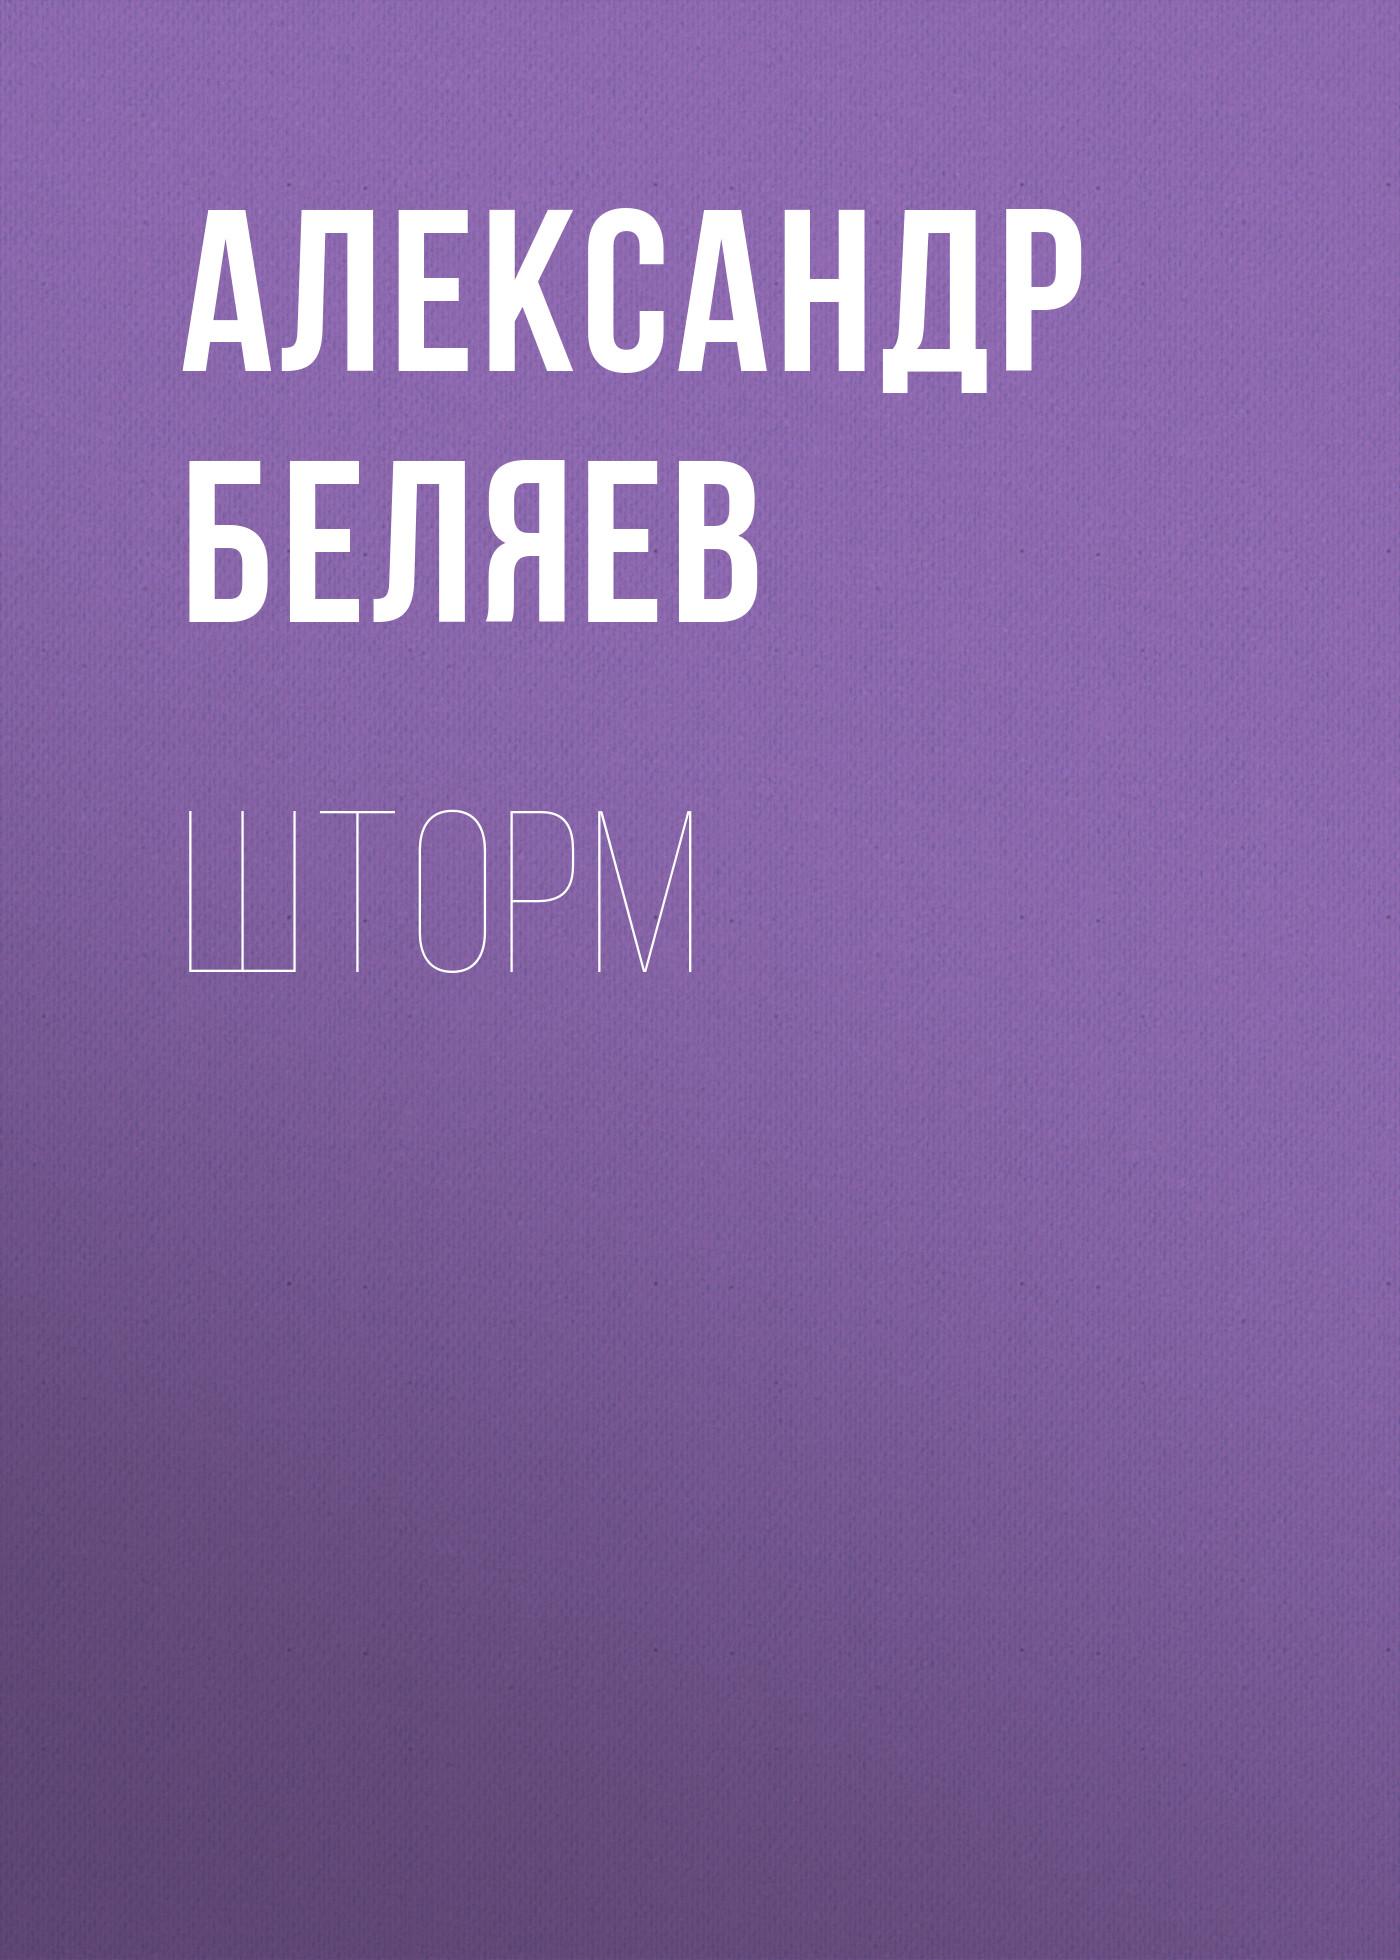 Александр Беляев Шторм александр филлипов всем по заслугам